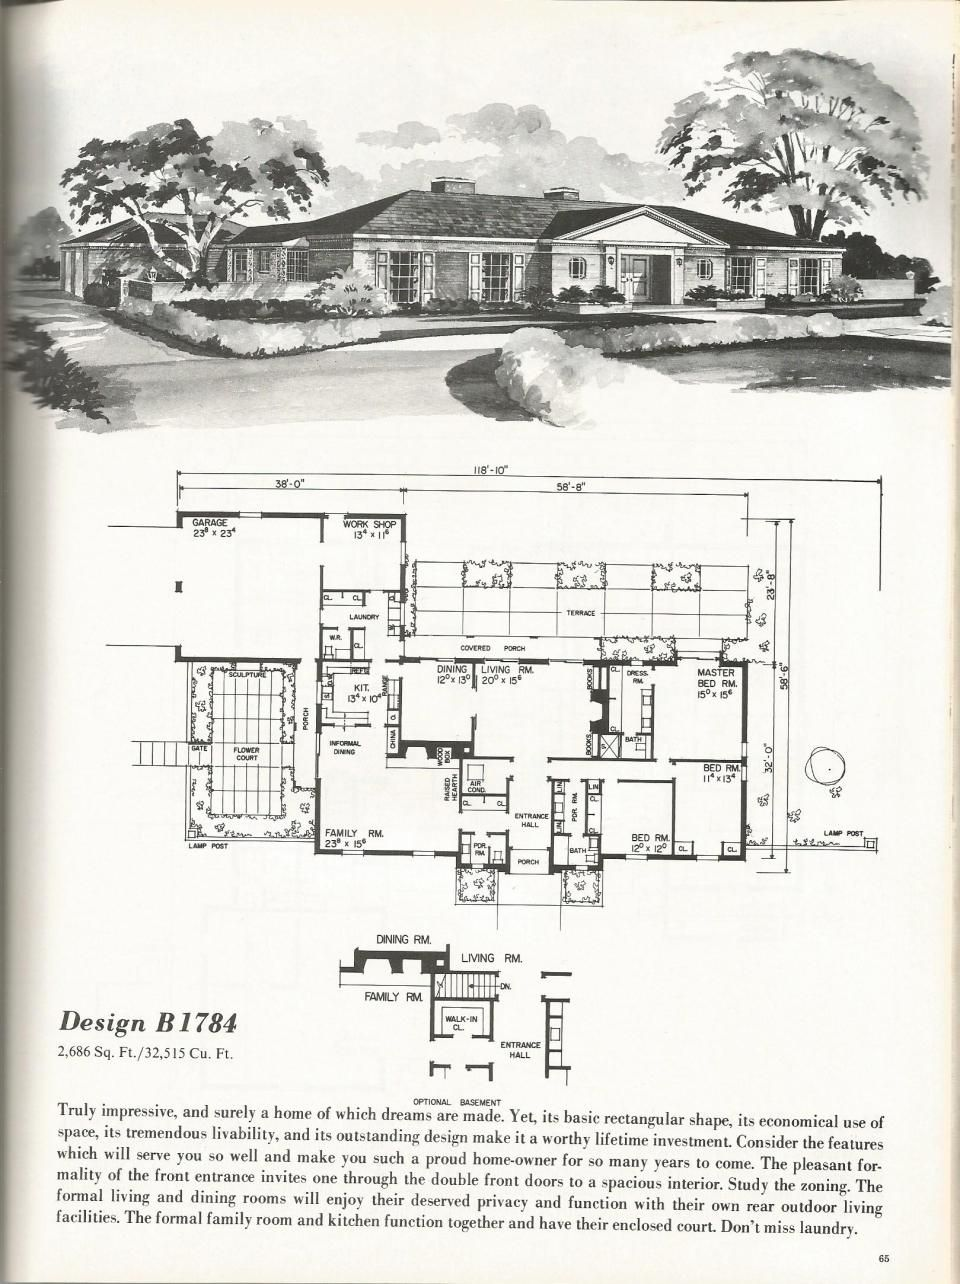 antique spacious mooramie house design   Vintage House Plans: Luxurious Homes   Antique Alter Ego ...